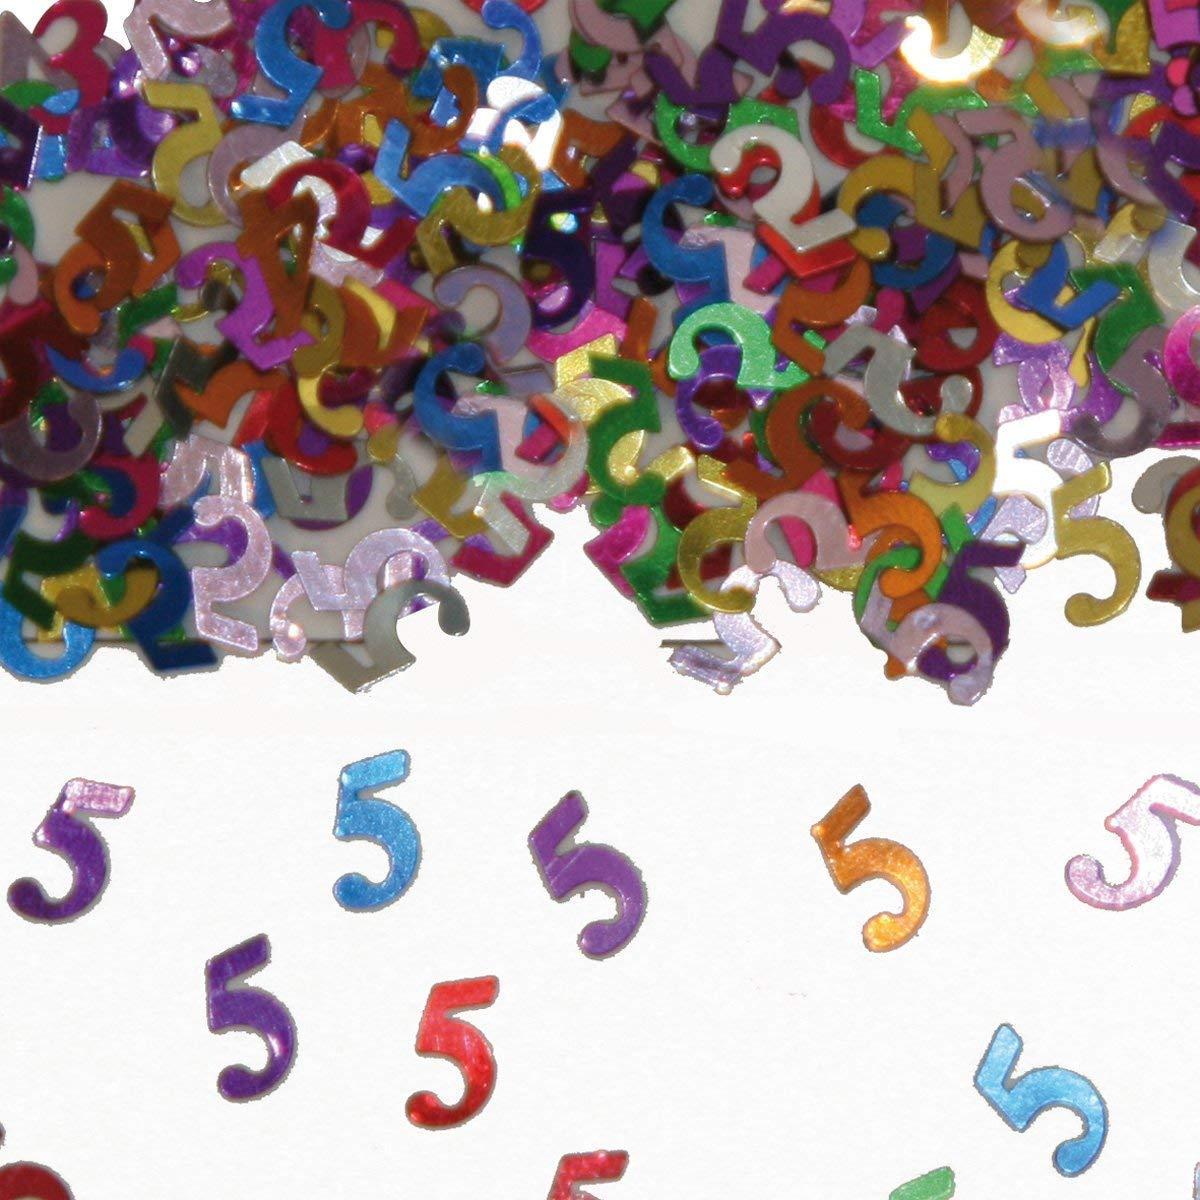 Folat Colorido brillantes N/úmero De Cumplea/ños aprox. 1000 /Único de Confeti decoraci/ón mesa decorativa Aniversario Confeti f/ünfter Cumplea/ños Ni/ños Cumplea/ños Ni/ños 5 BOLSA CON 15 G